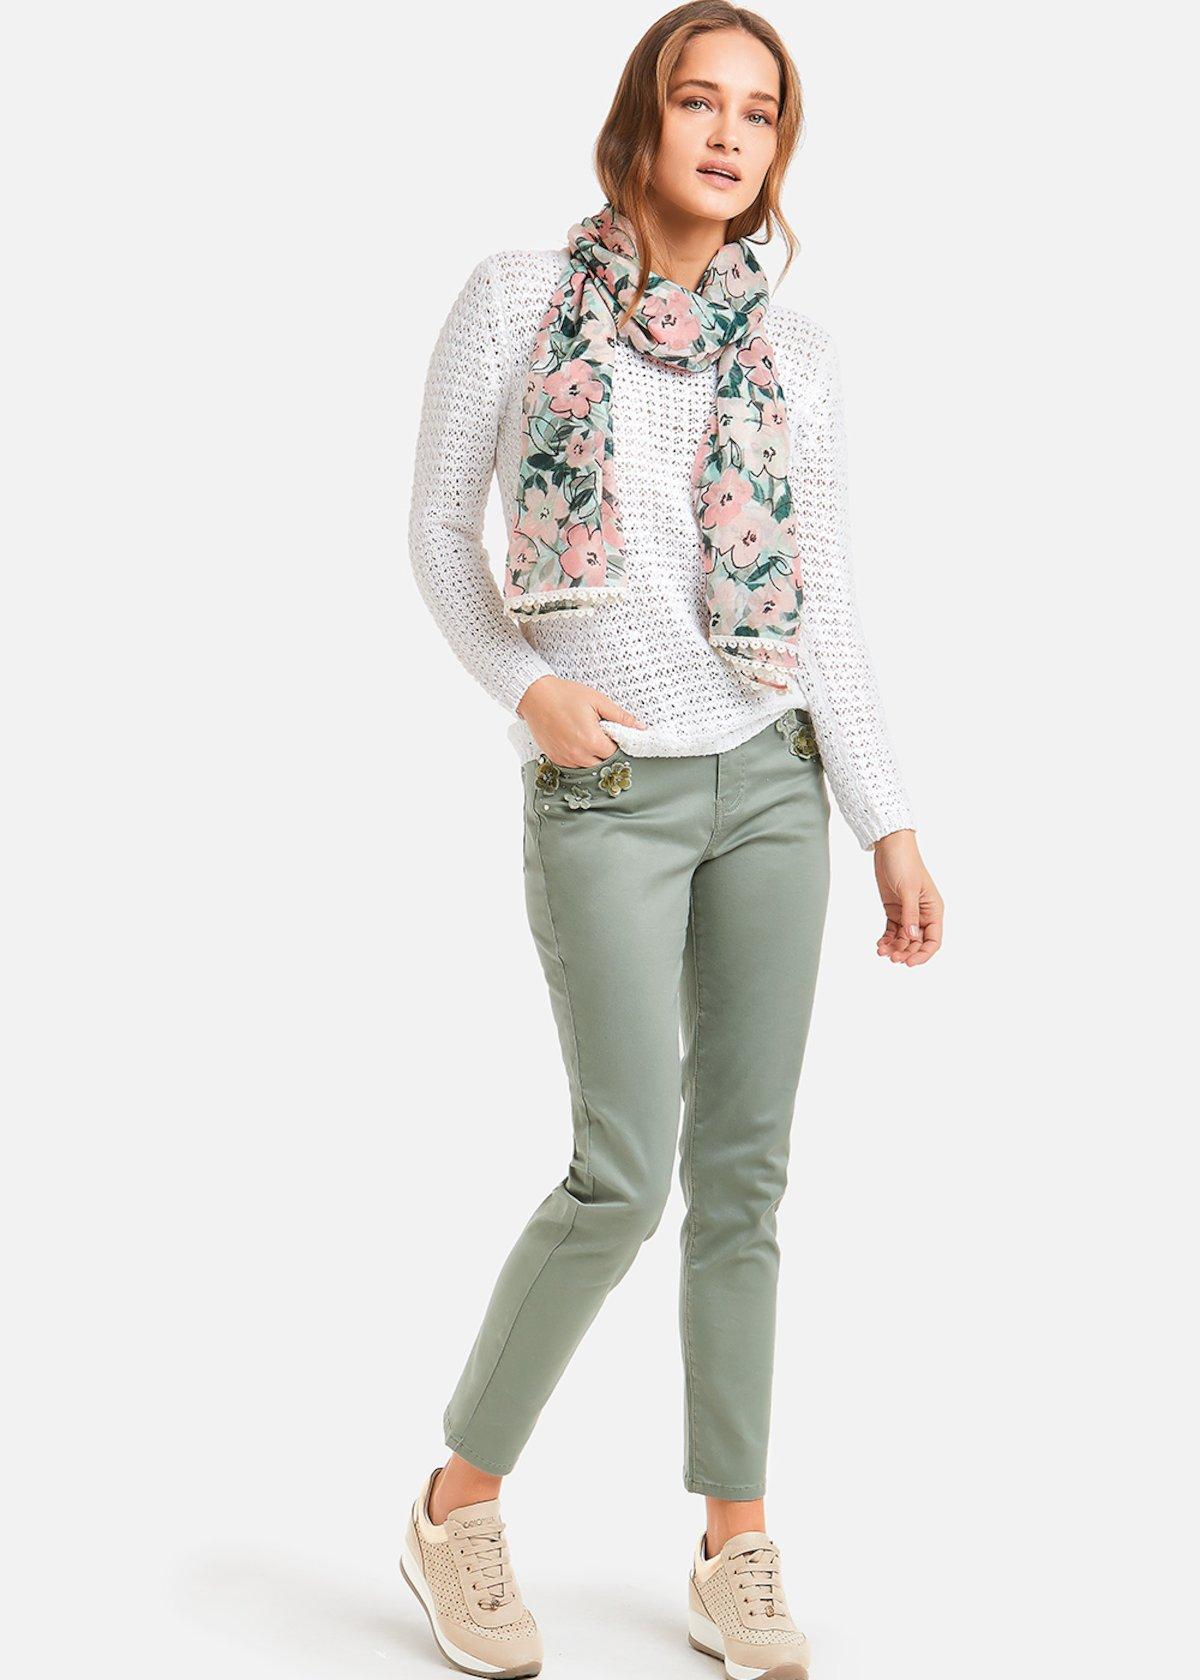 Satin cotton Primus trousers